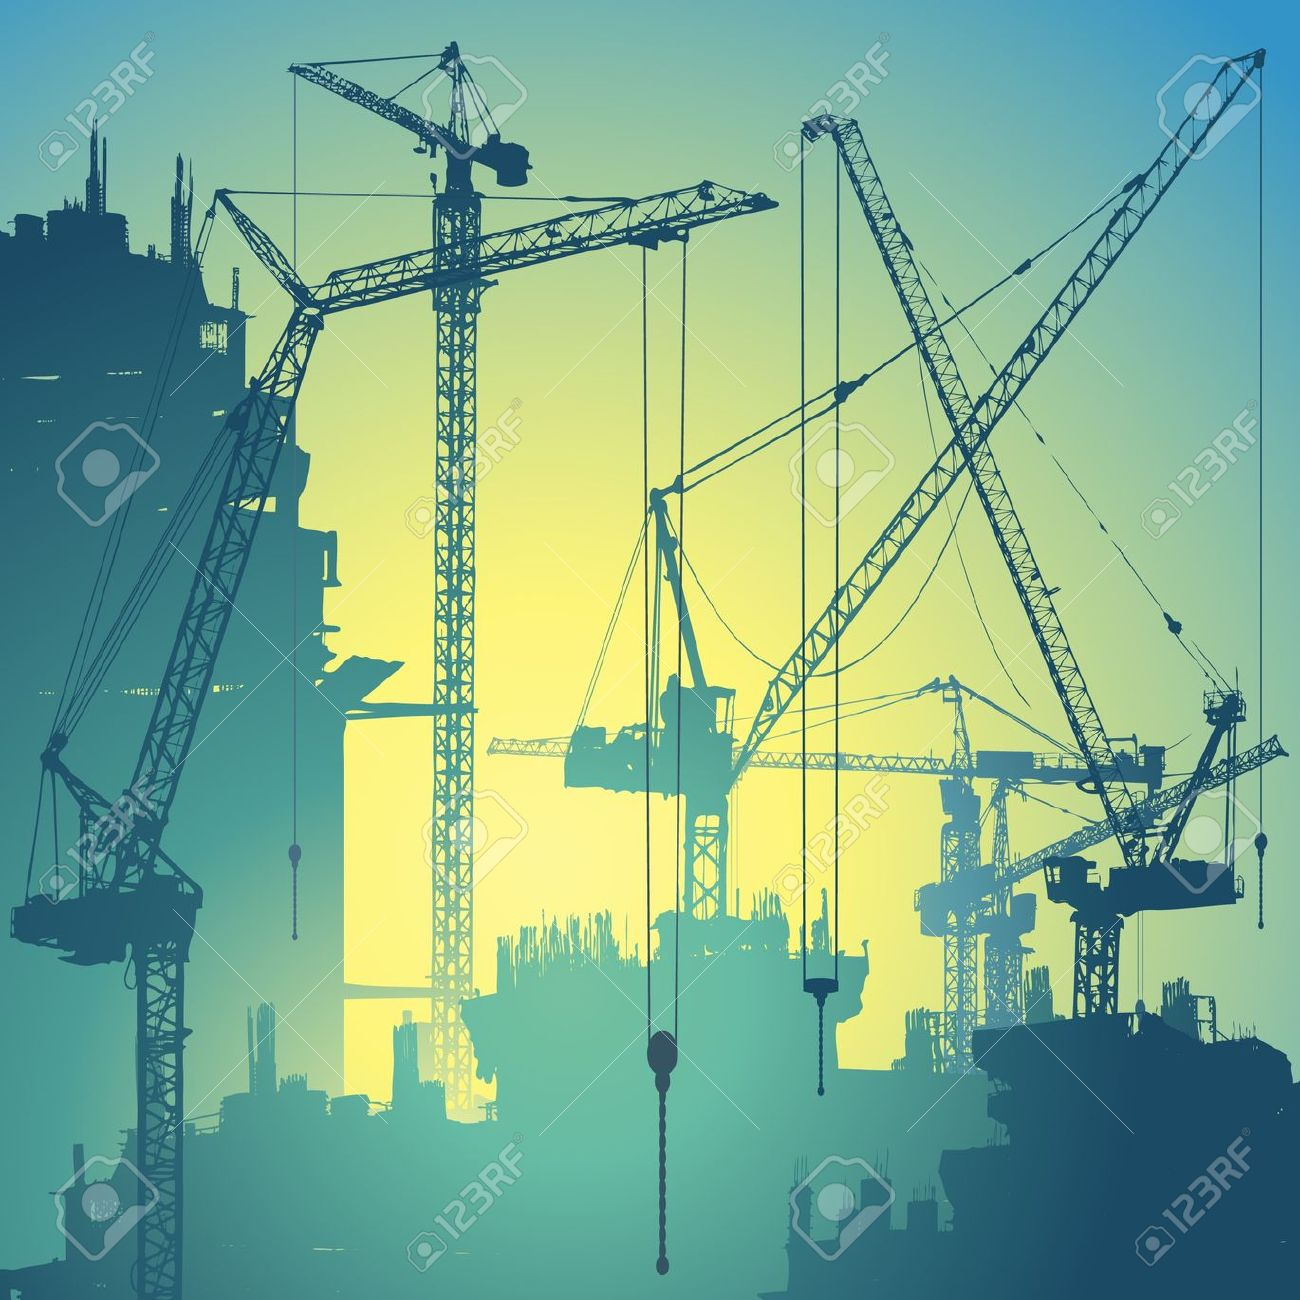 Construction site background clipart svg library stock Construction site background clipart - ClipartFest svg library stock